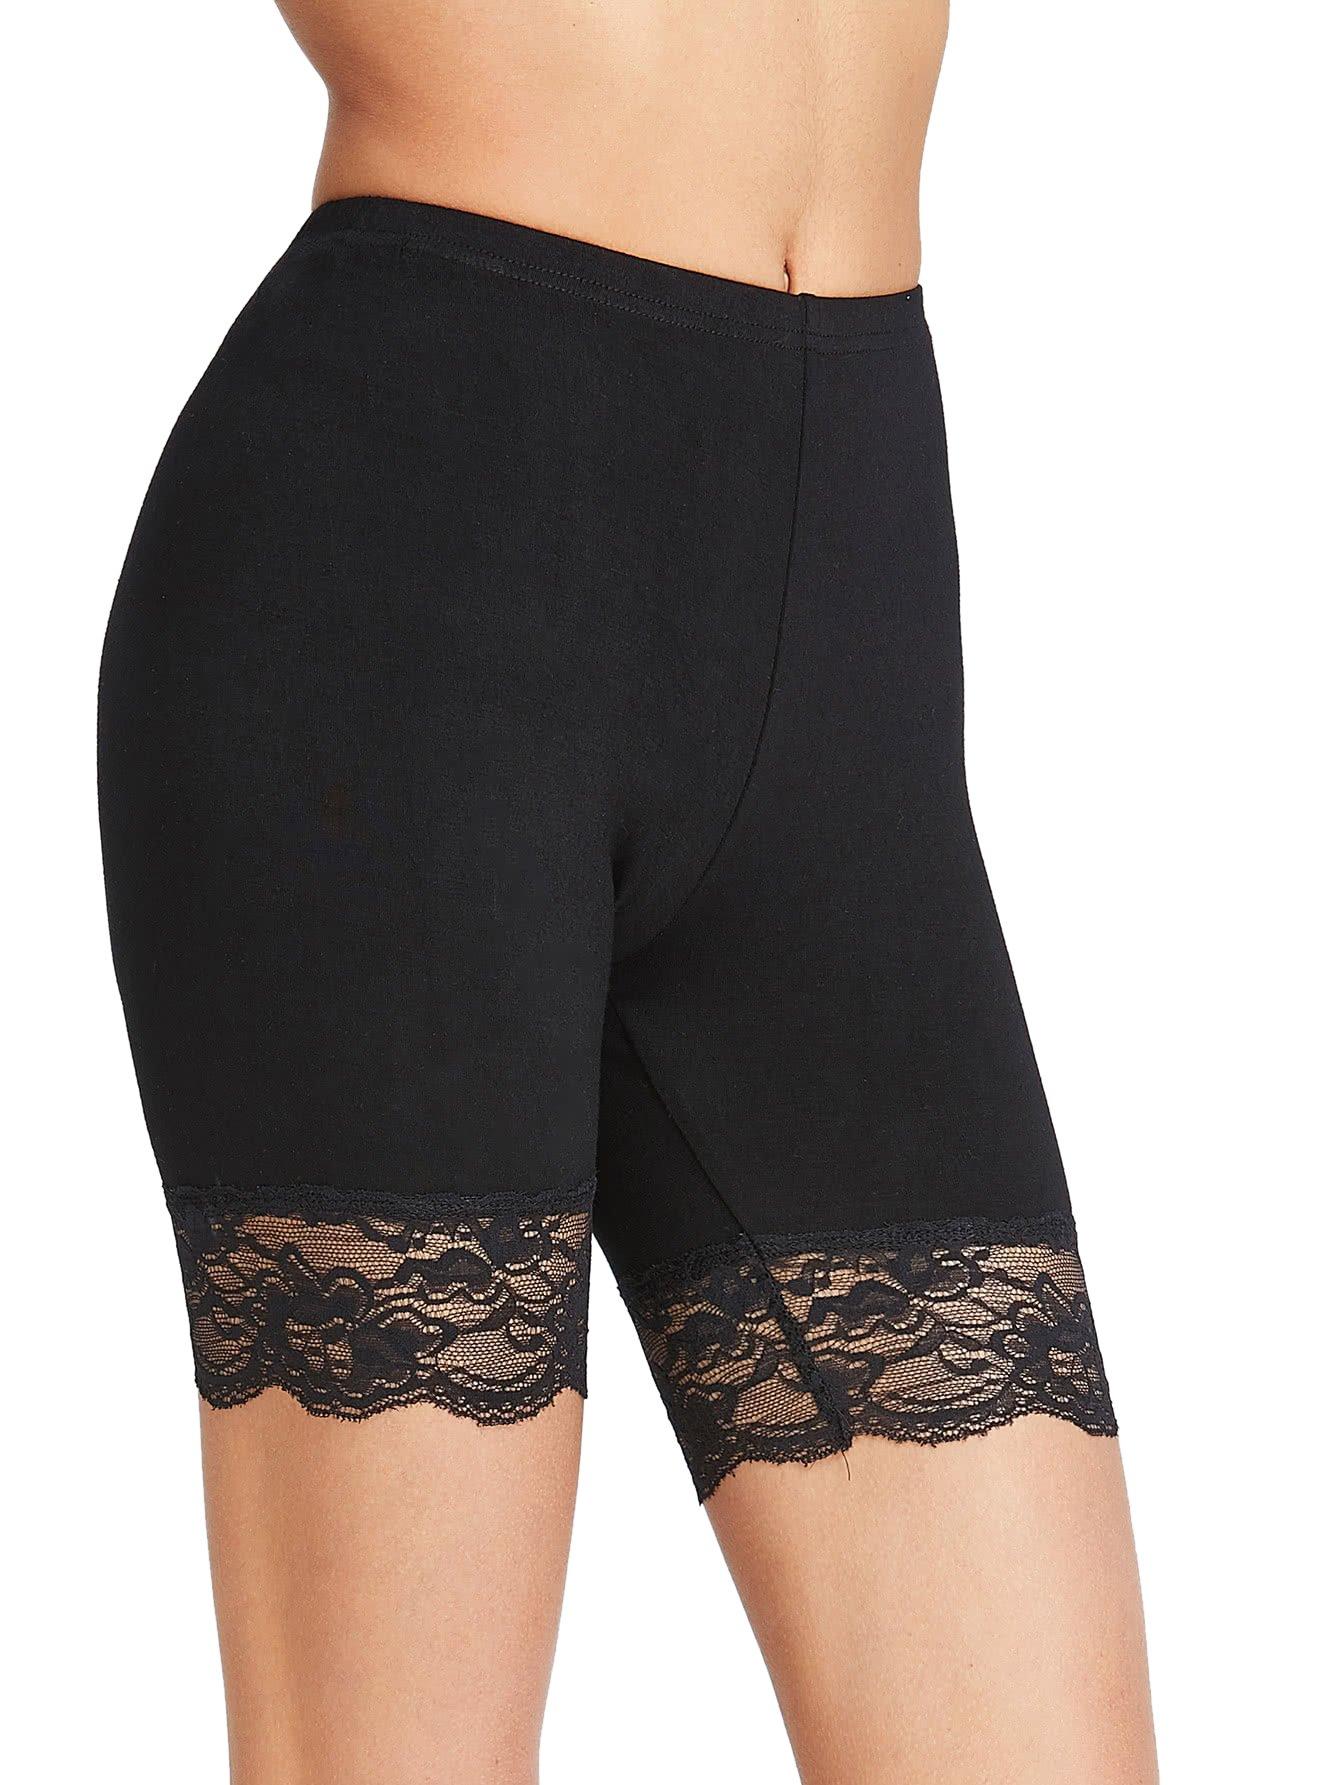 SweatyRocks Women's Sexy Thin Stretch Short Leggings with Lace Trim Black L